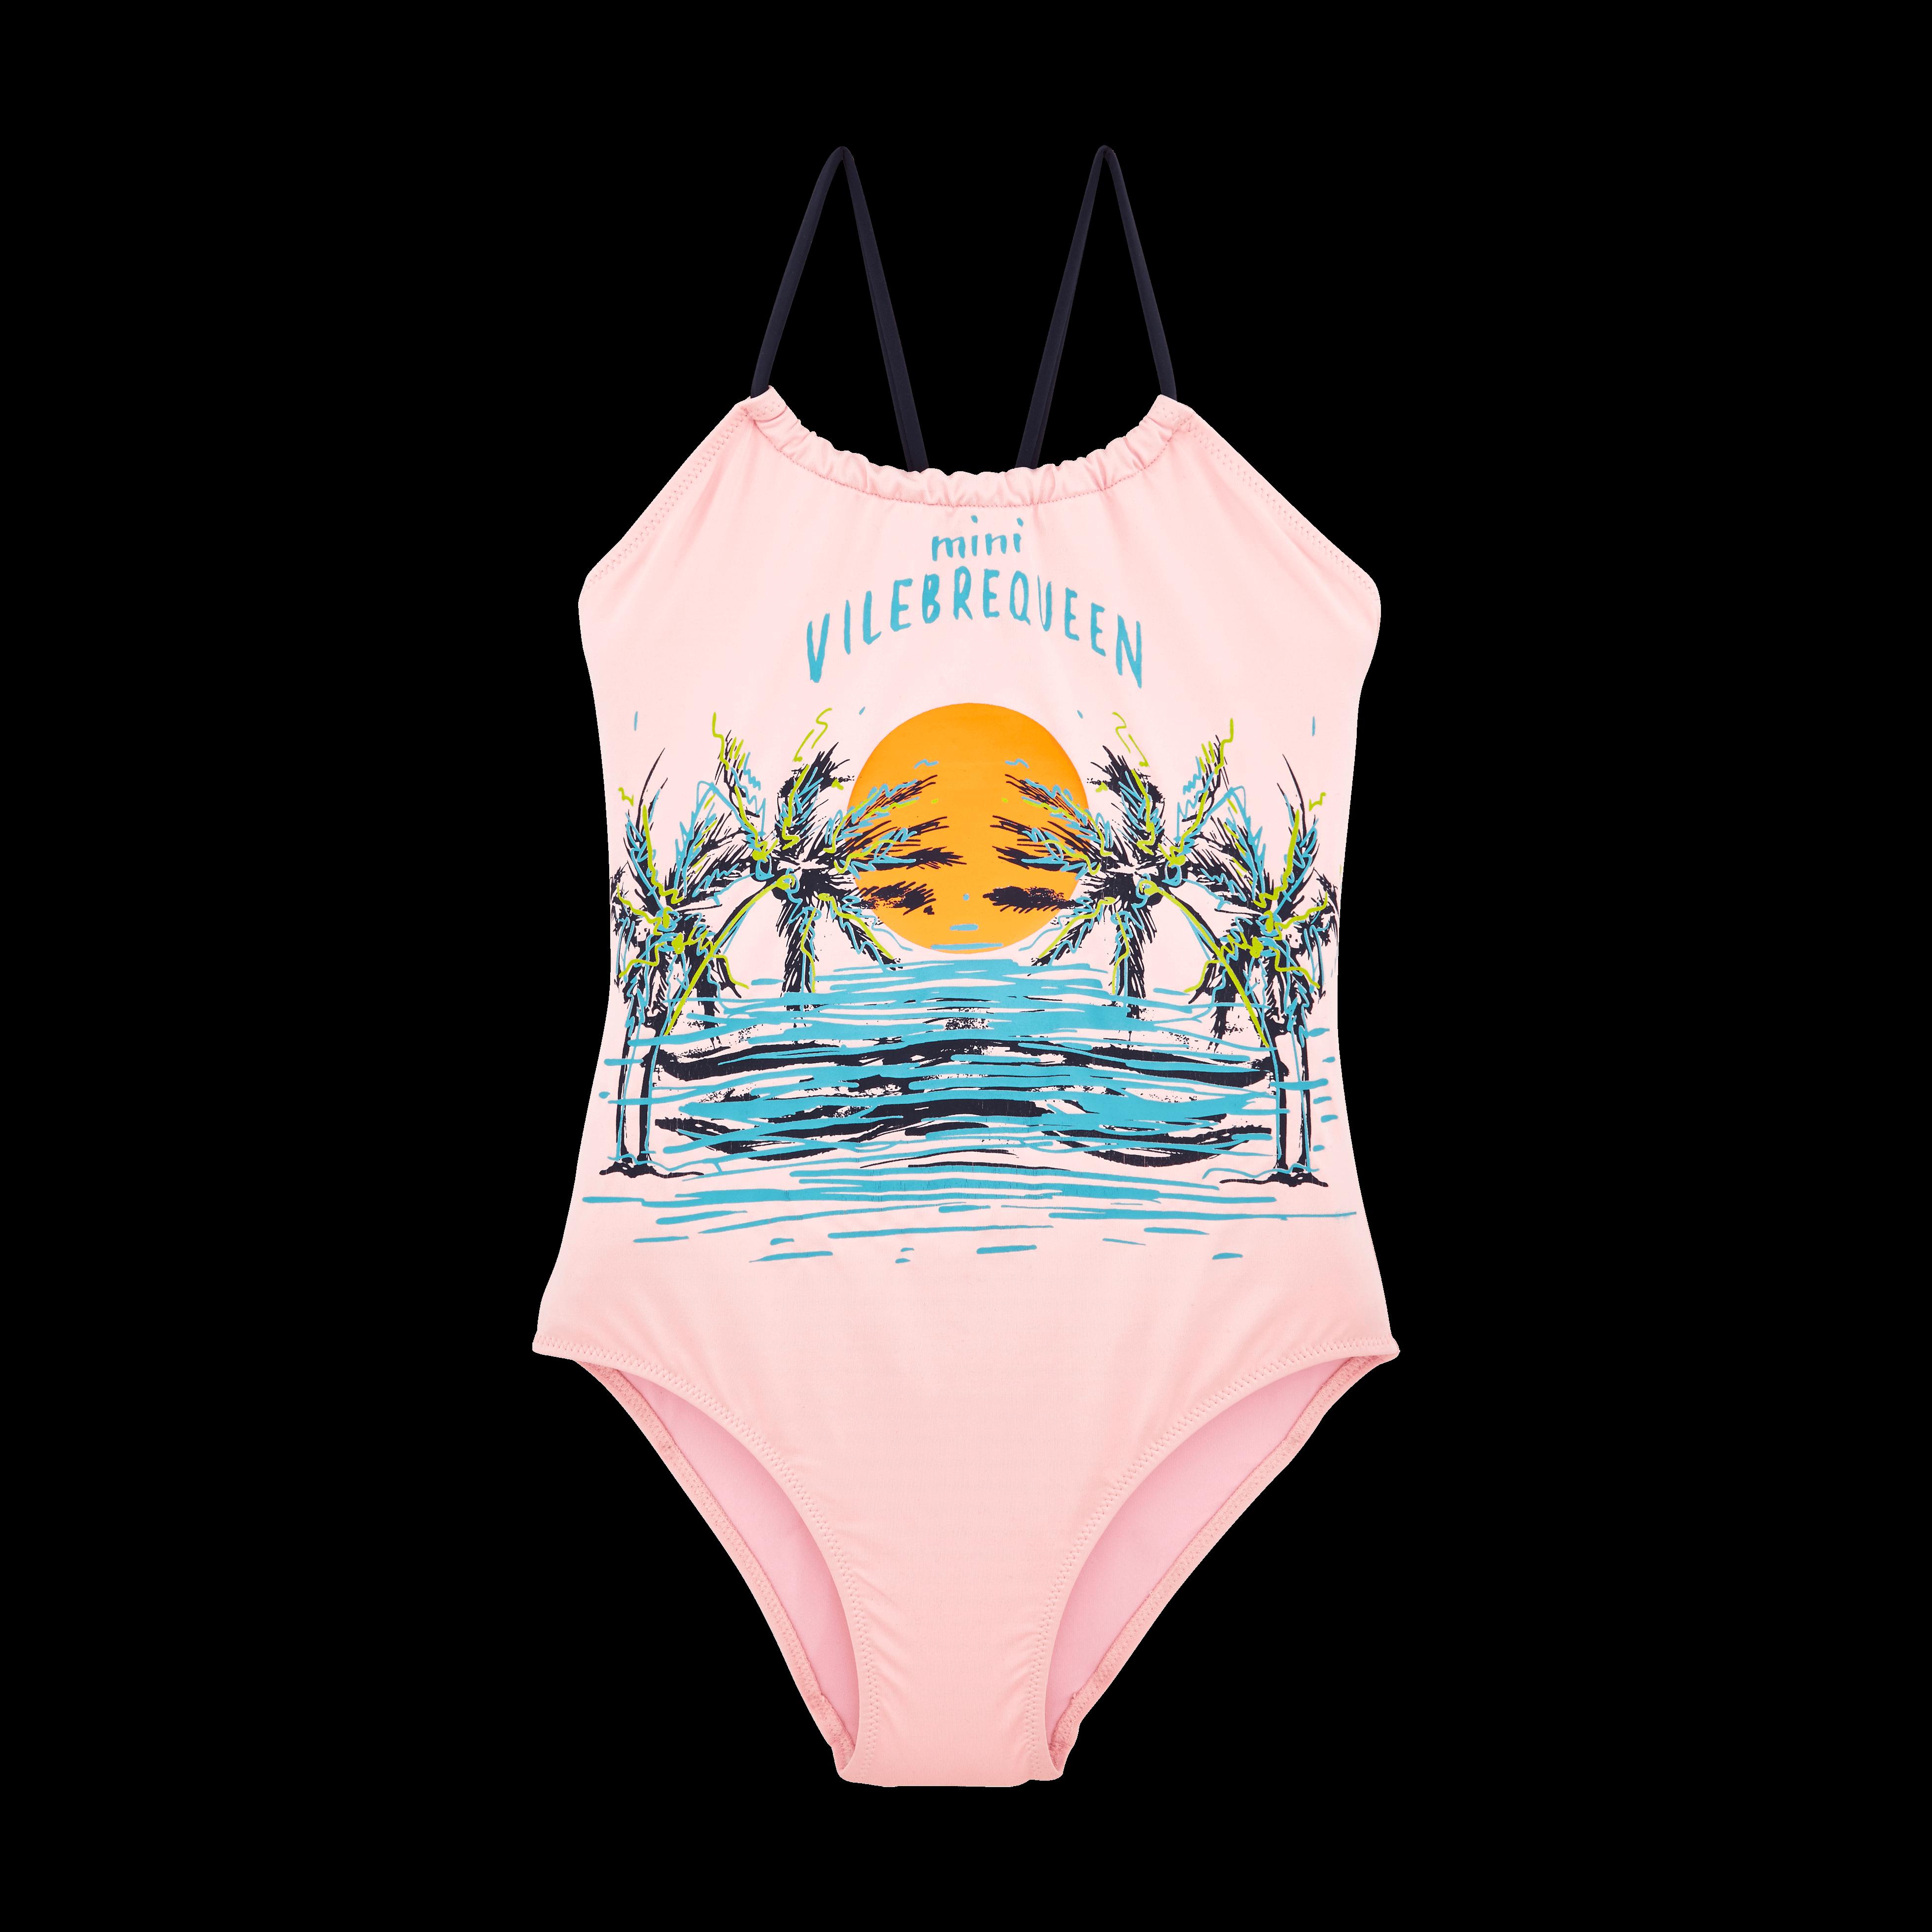 VILEBREQUIN | Girls Swimwear - Girls One Piece Swimsuit Mini Vilebrequeen - SWIMMING TRUNK - GAZETTE - Pink - 12 - Vilebrequin | Goxip